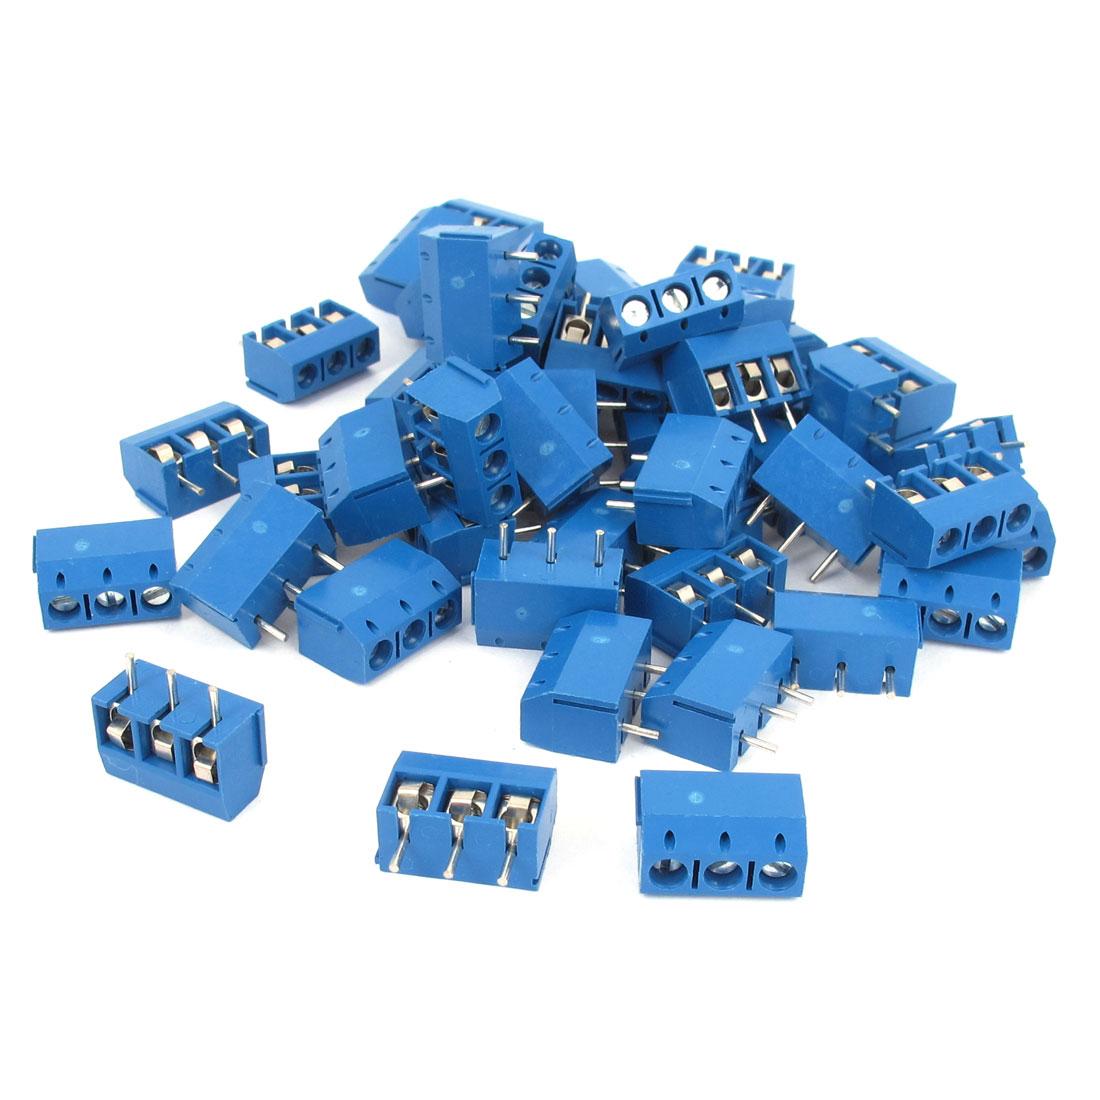 50Pcs 4.5mm Pitch PCB Screw Terminal Block Connector 300V 10A